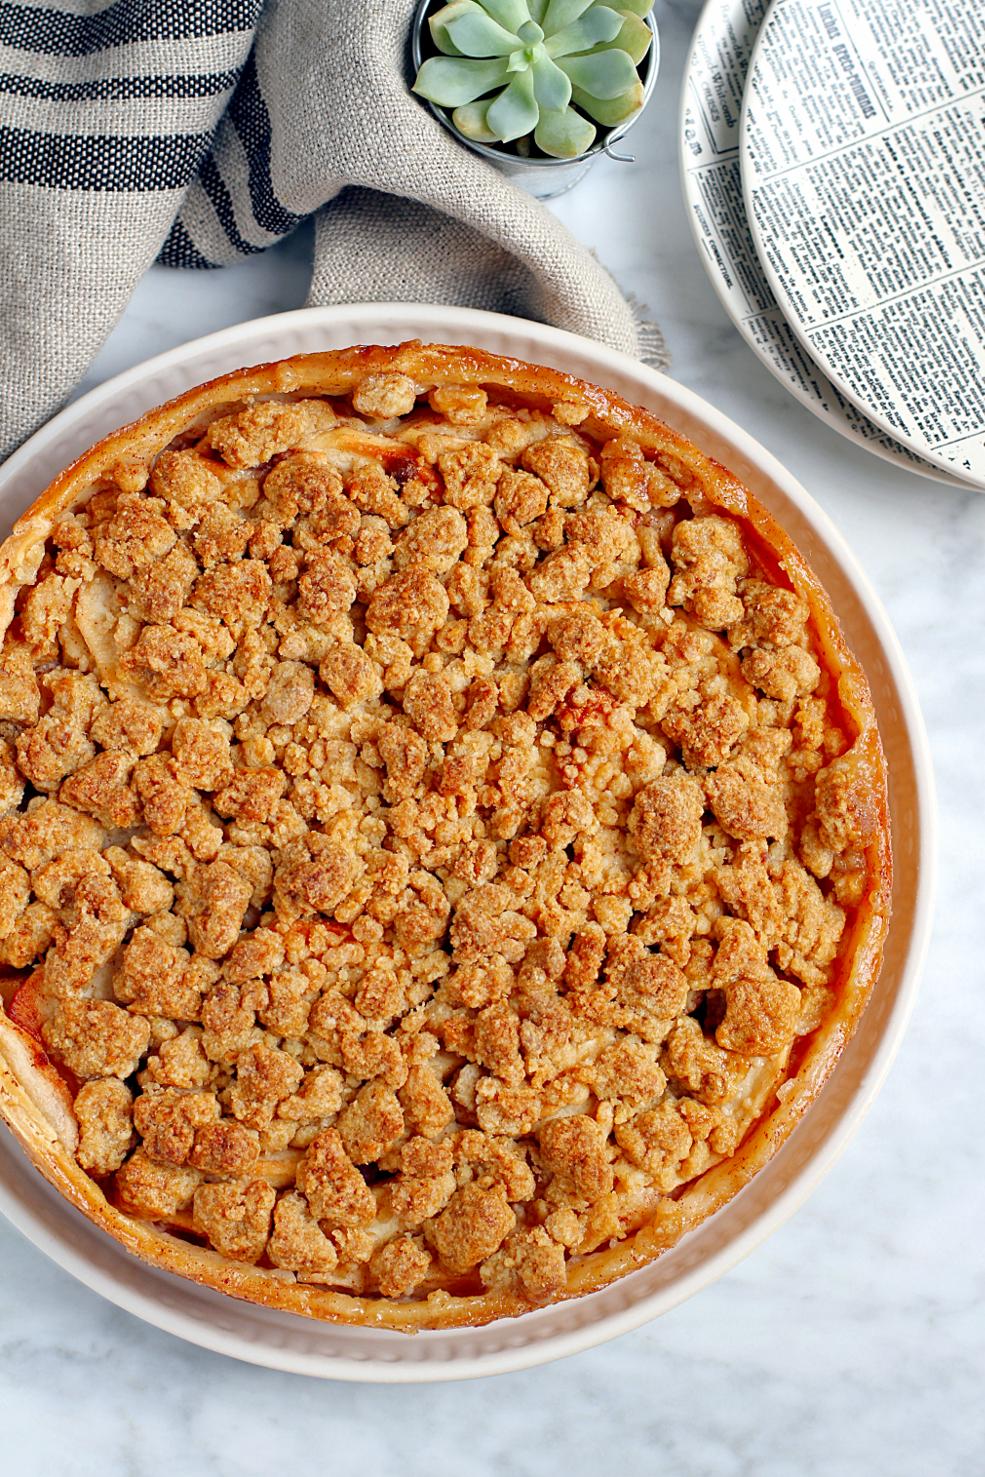 Image of Pennsylvania Dutch apple pie.